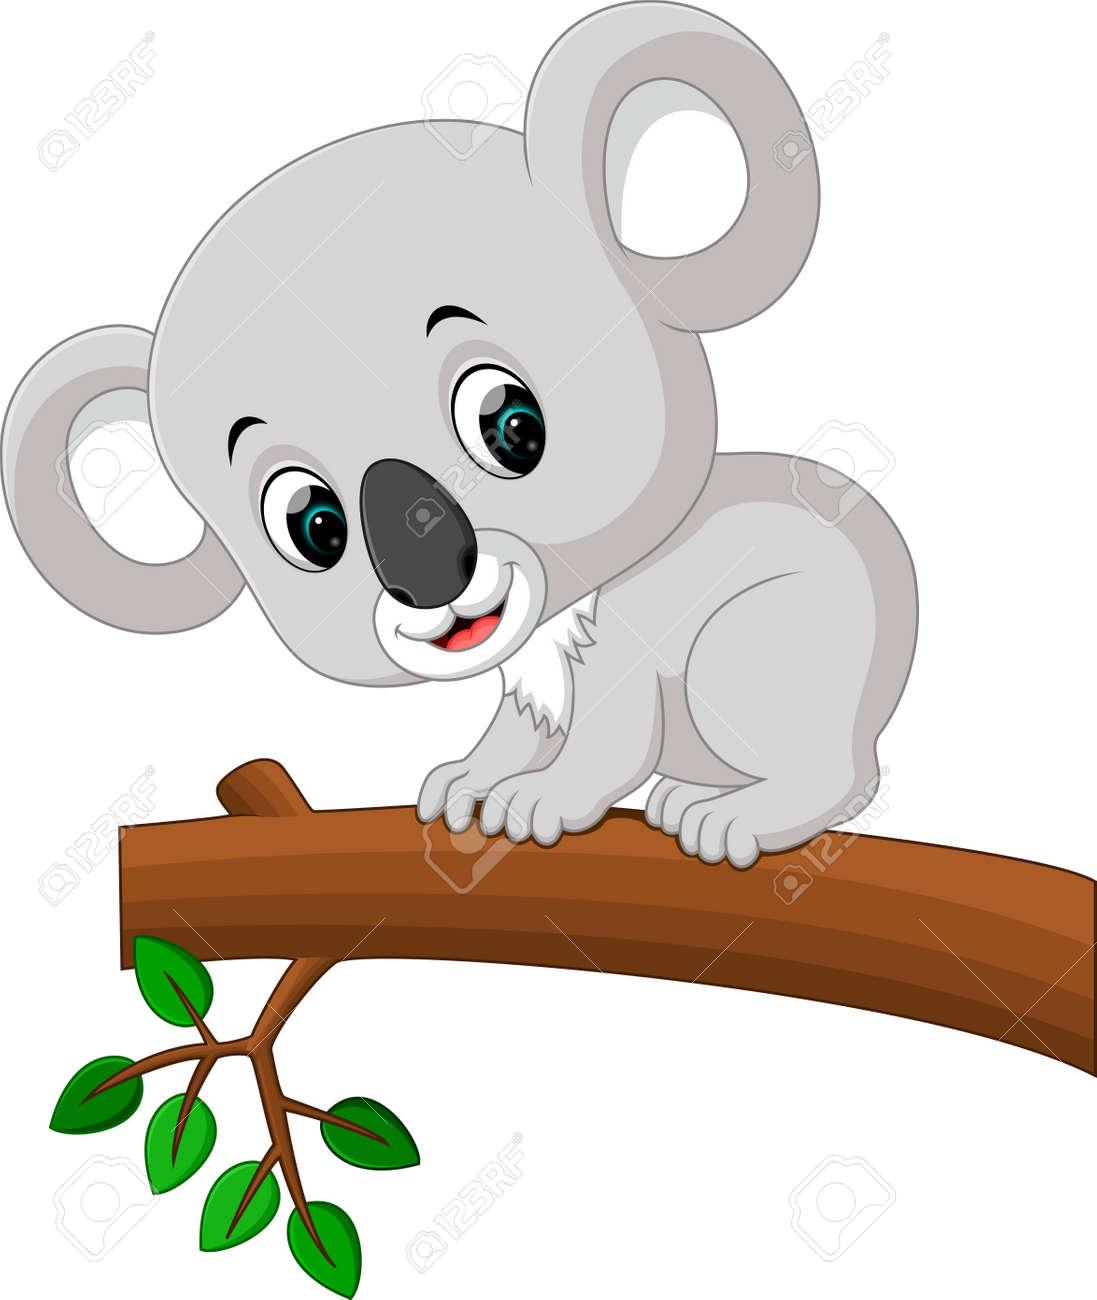 Dessin Anime Mignon Koala Banque D Images Et Photos Libres De Droits